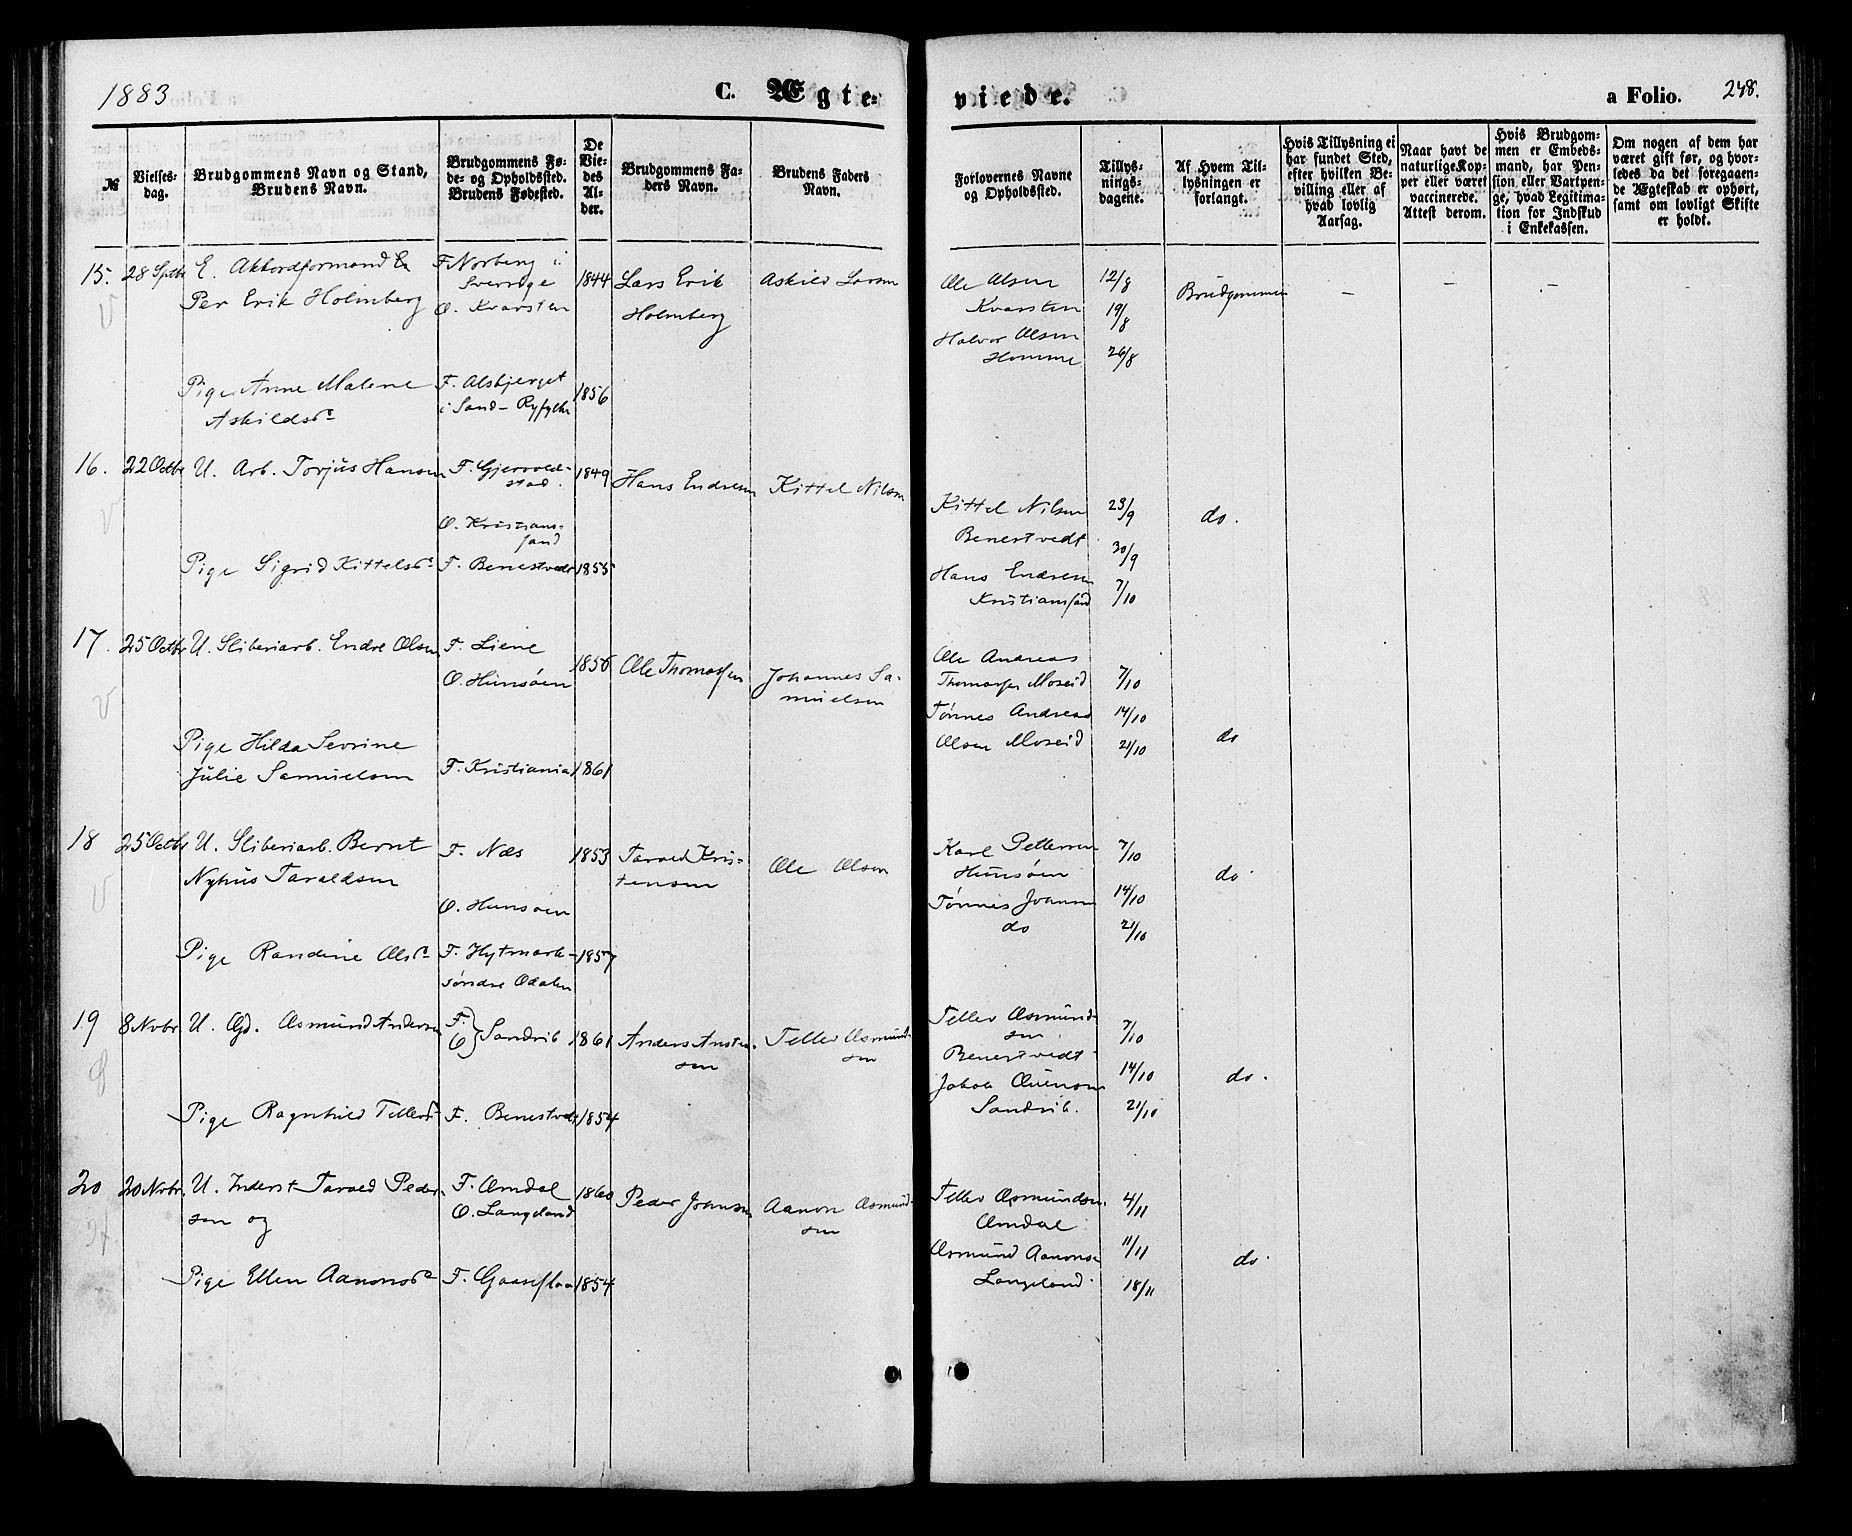 SAK, Vennesla sokneprestkontor, Fa/Fac/L0008: Ministerialbok nr. A 8, 1874-1883, s. 248